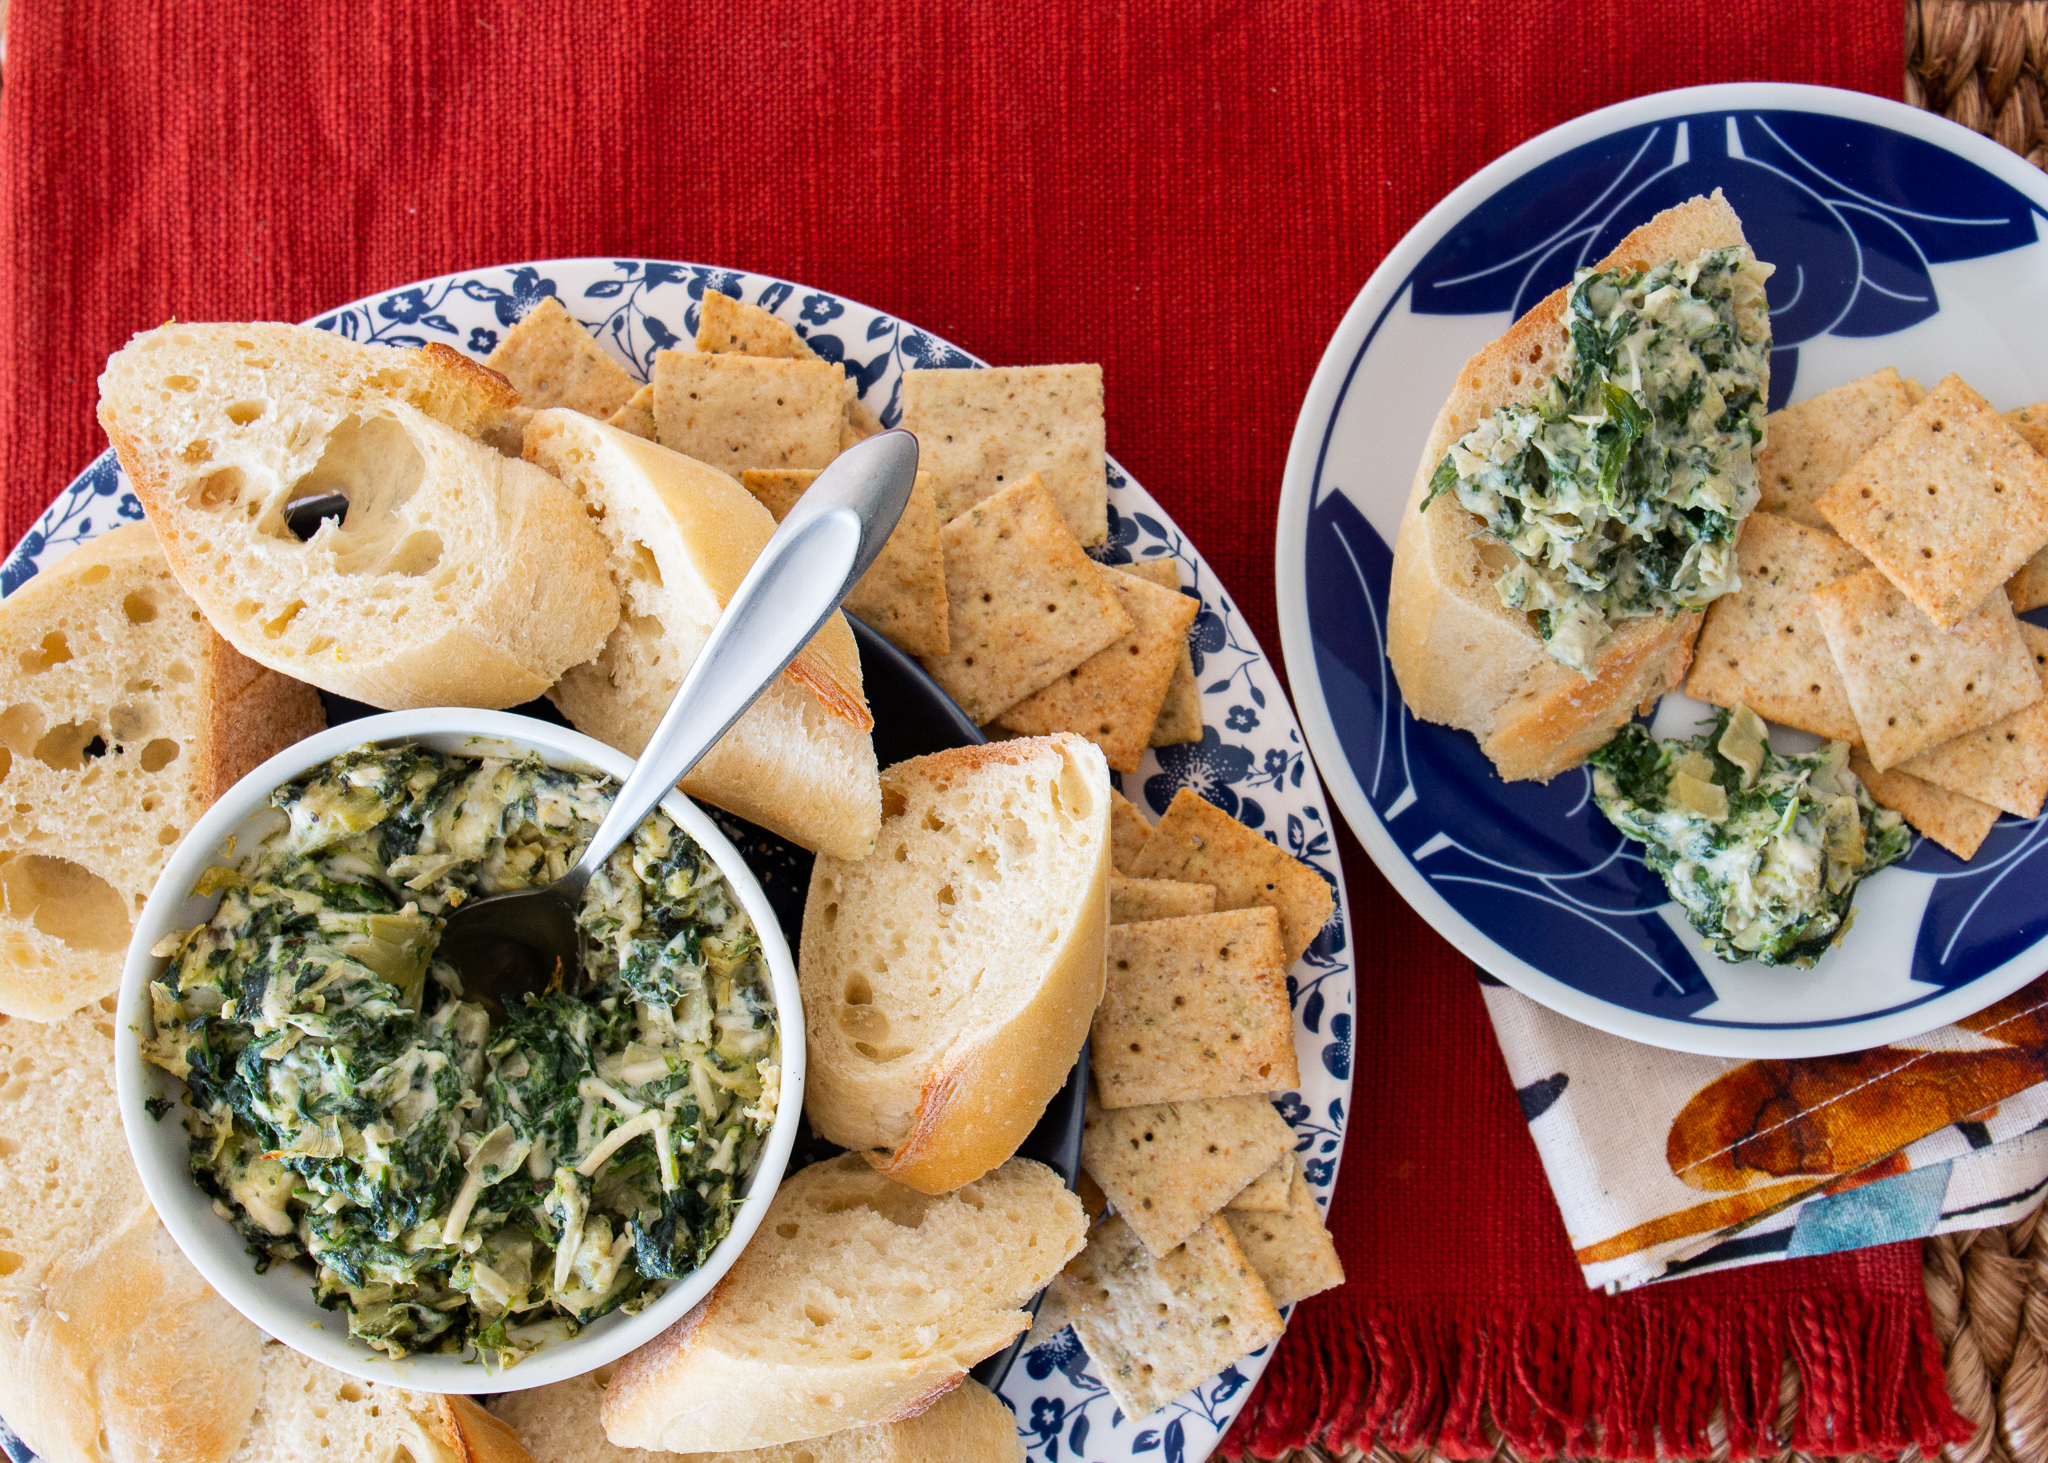 Vegan Hot Artichoke and Spinach Dip